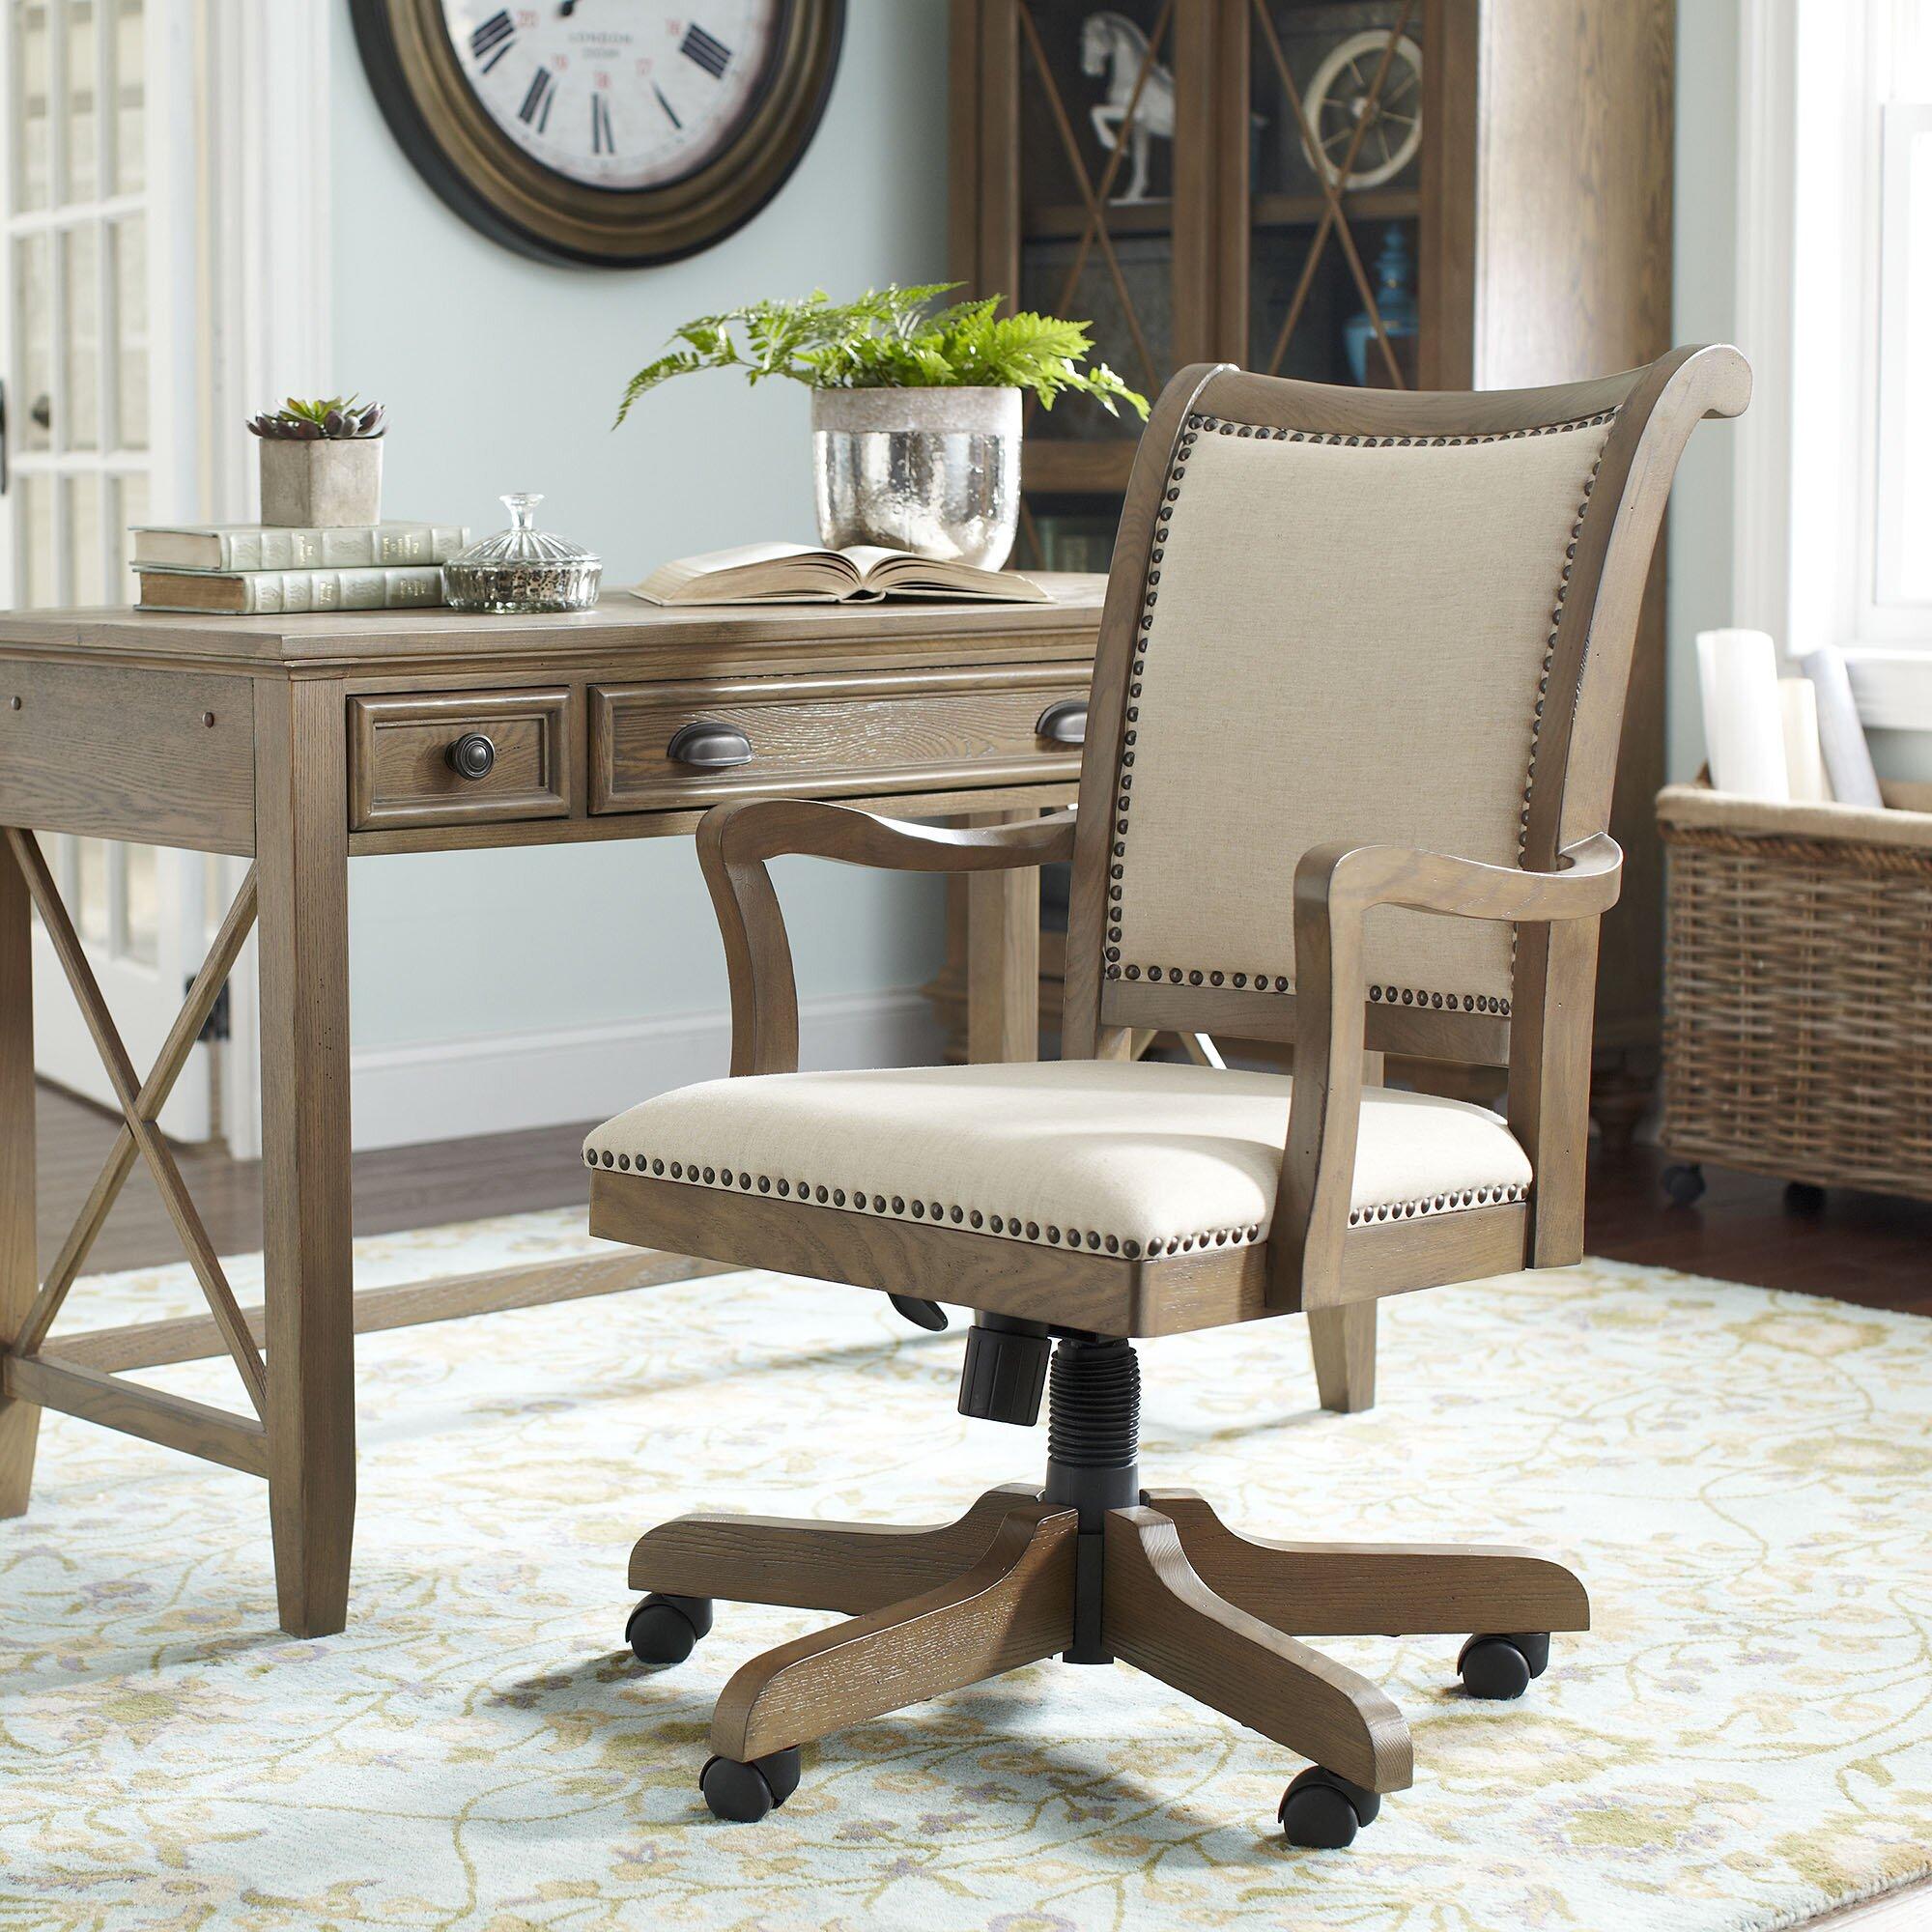 Birch lane wetherly swivel desk chair reviews birch lane for Chair with swivel desk